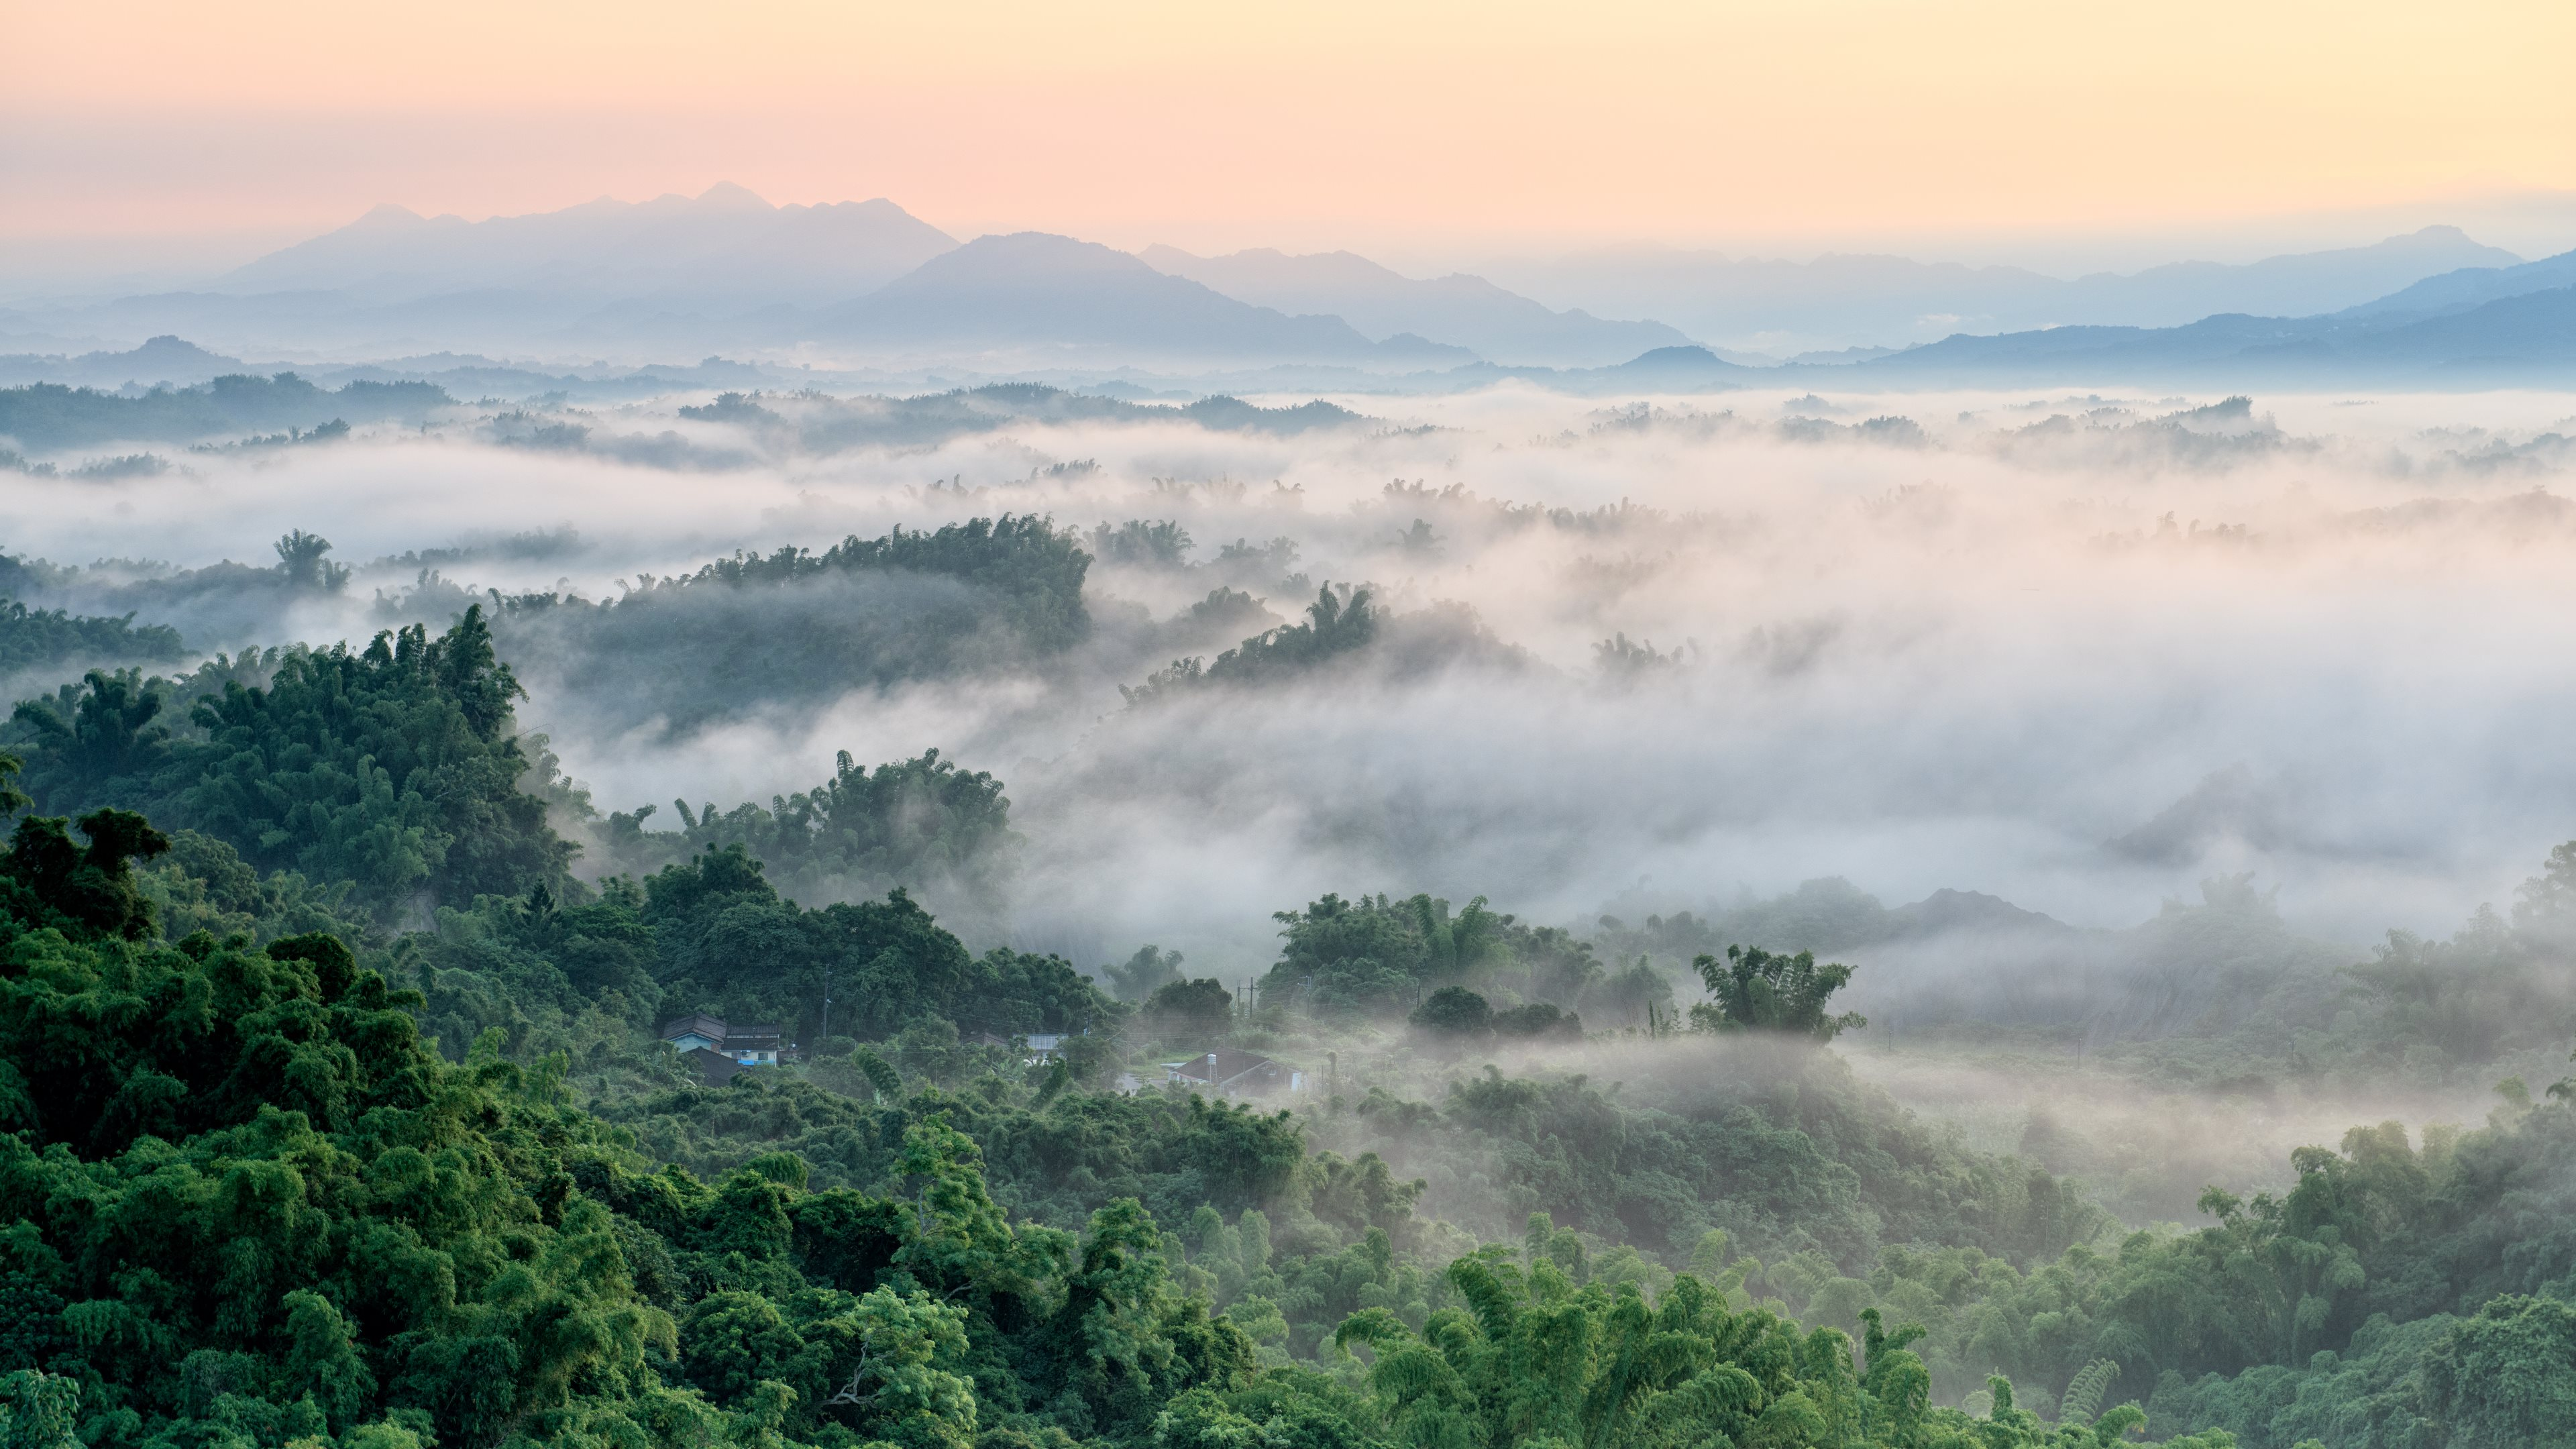 Foggy Landscape 4k Ultra Hd Wallpaper And Background Image